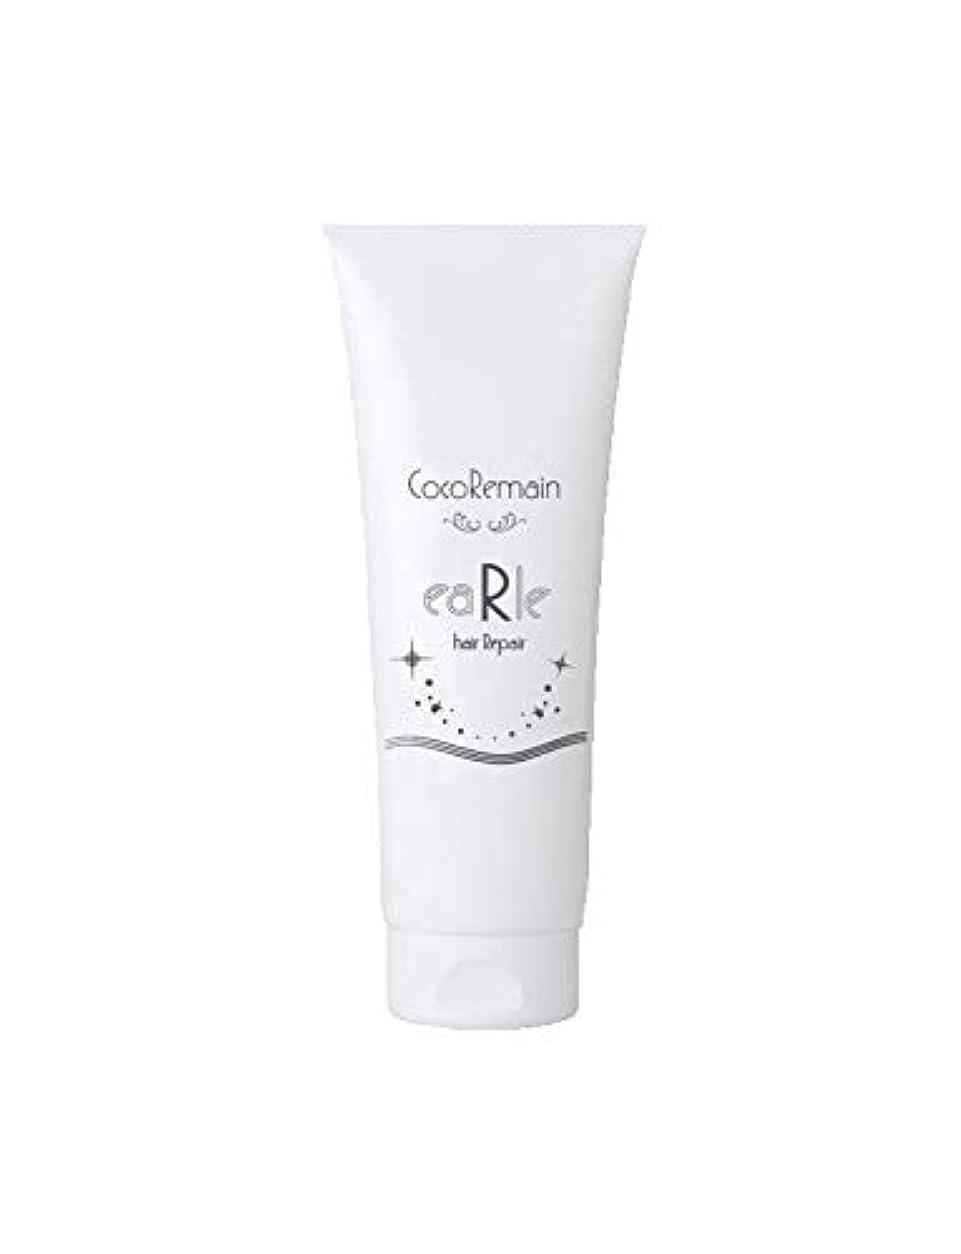 CocoRemain revive treatment 【リビーブ ヘアリペア】 250g